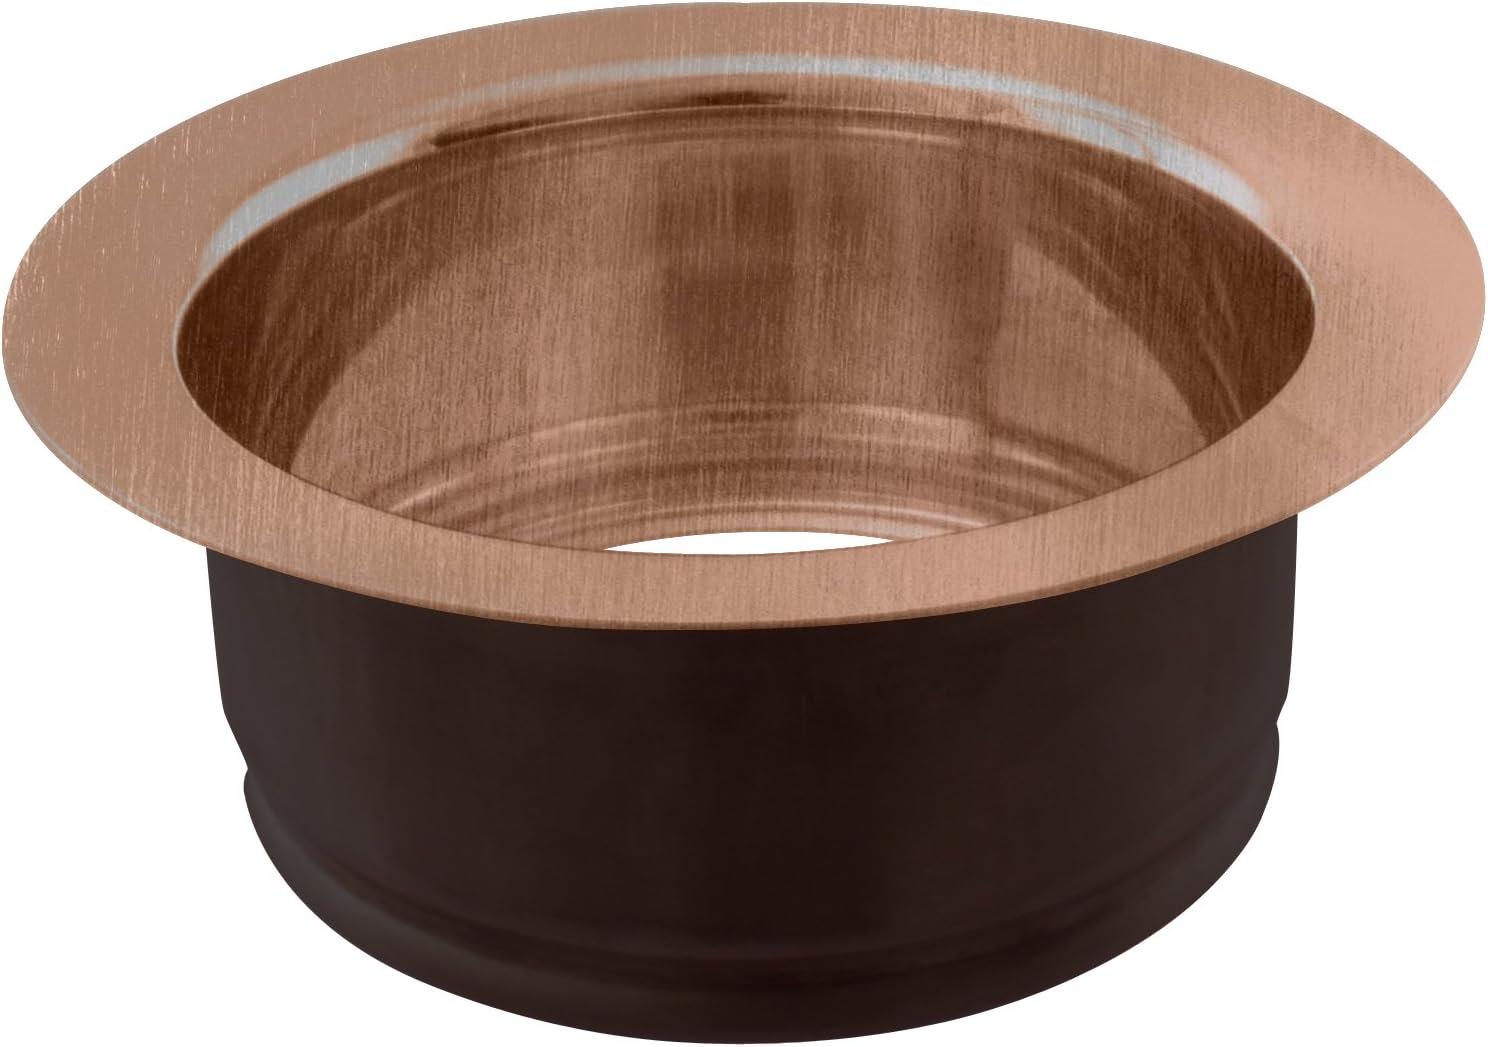 Westbrass D208-11 Disposal Flange, Antique Copper